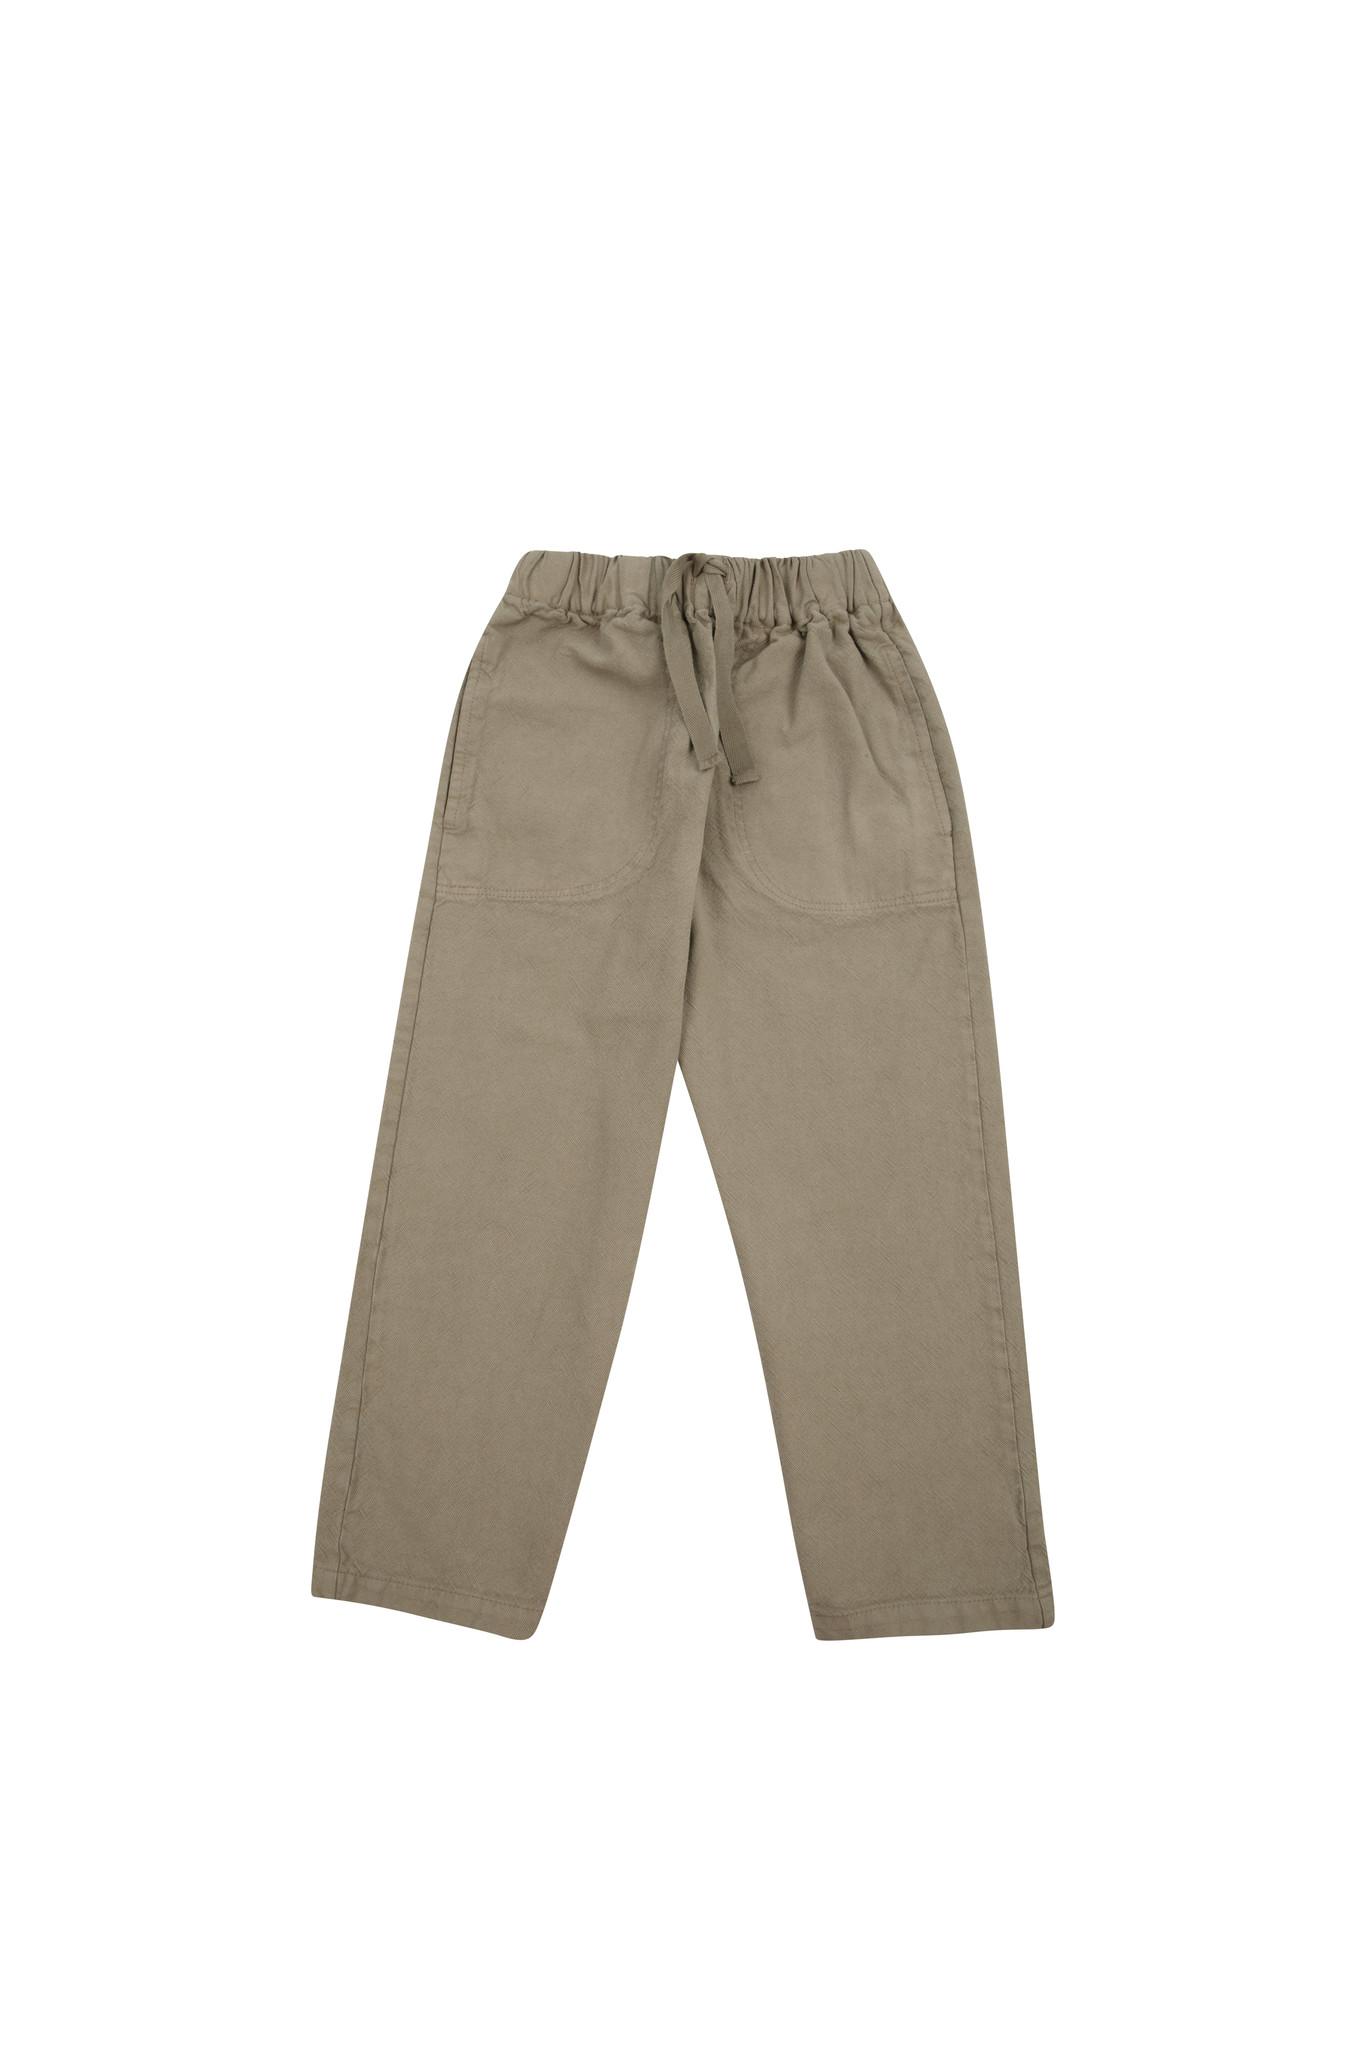 Paris pants - Khaki-1